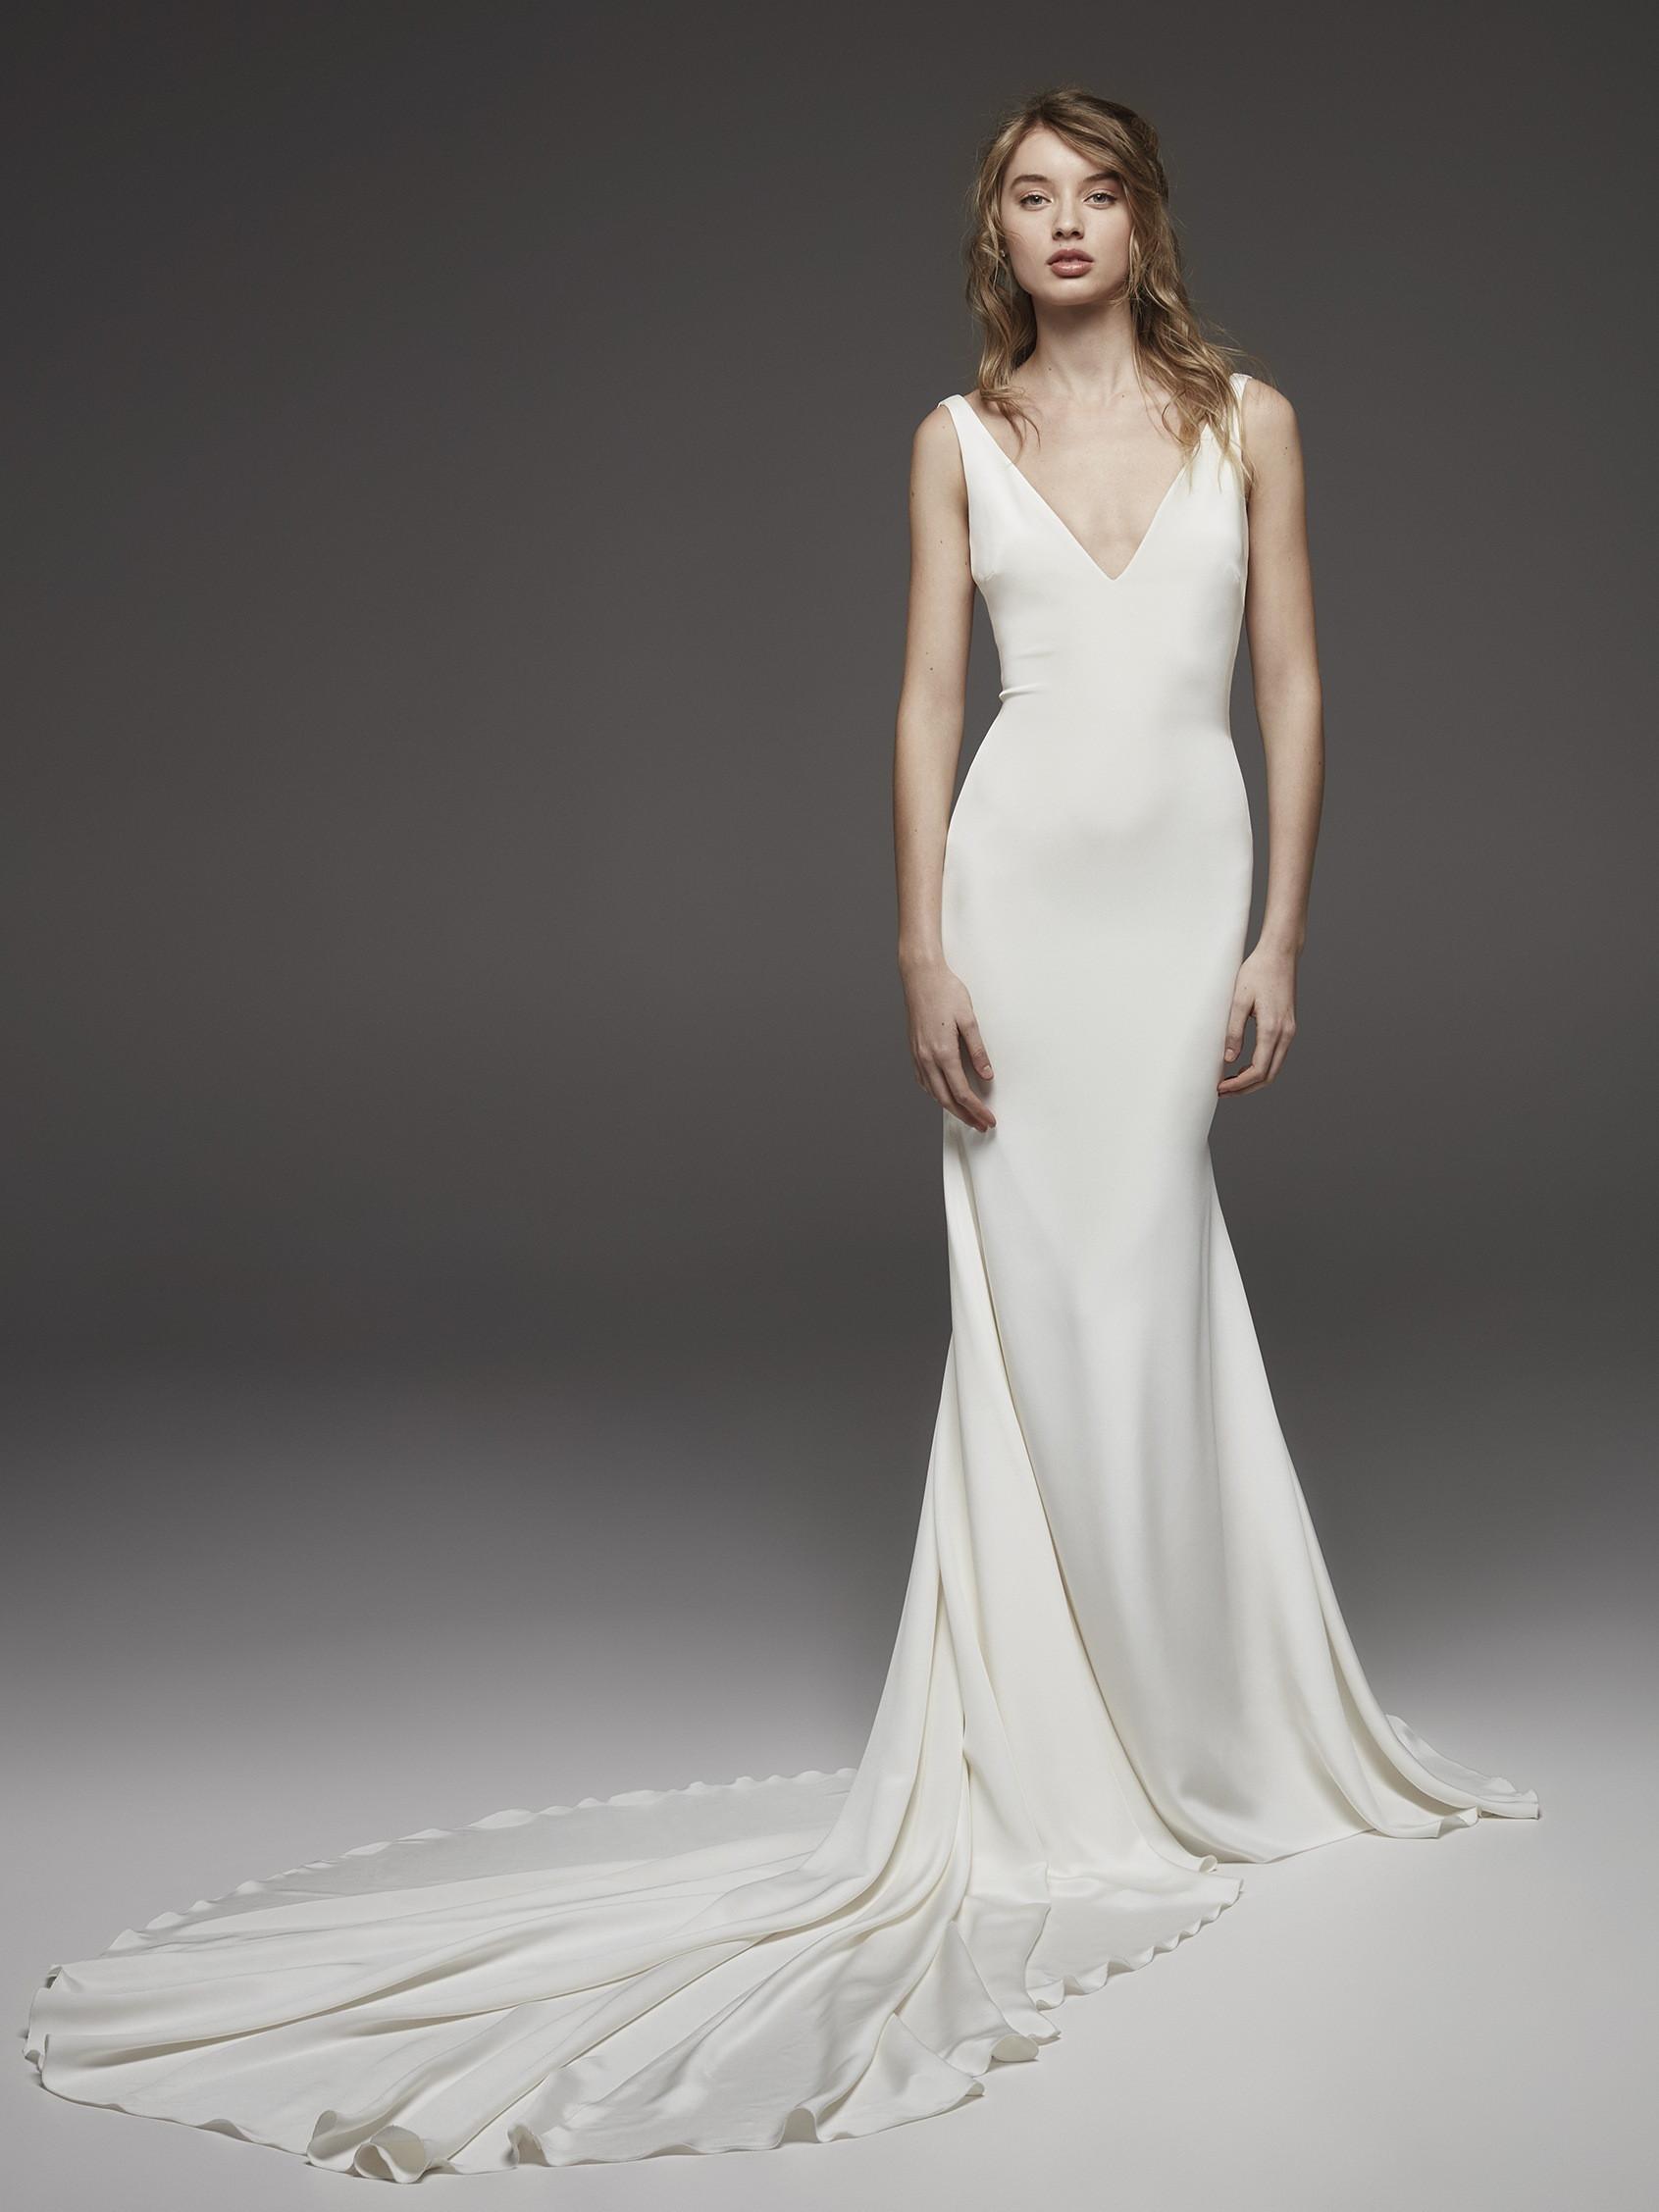 silk sheath wedding dresses photo - 1